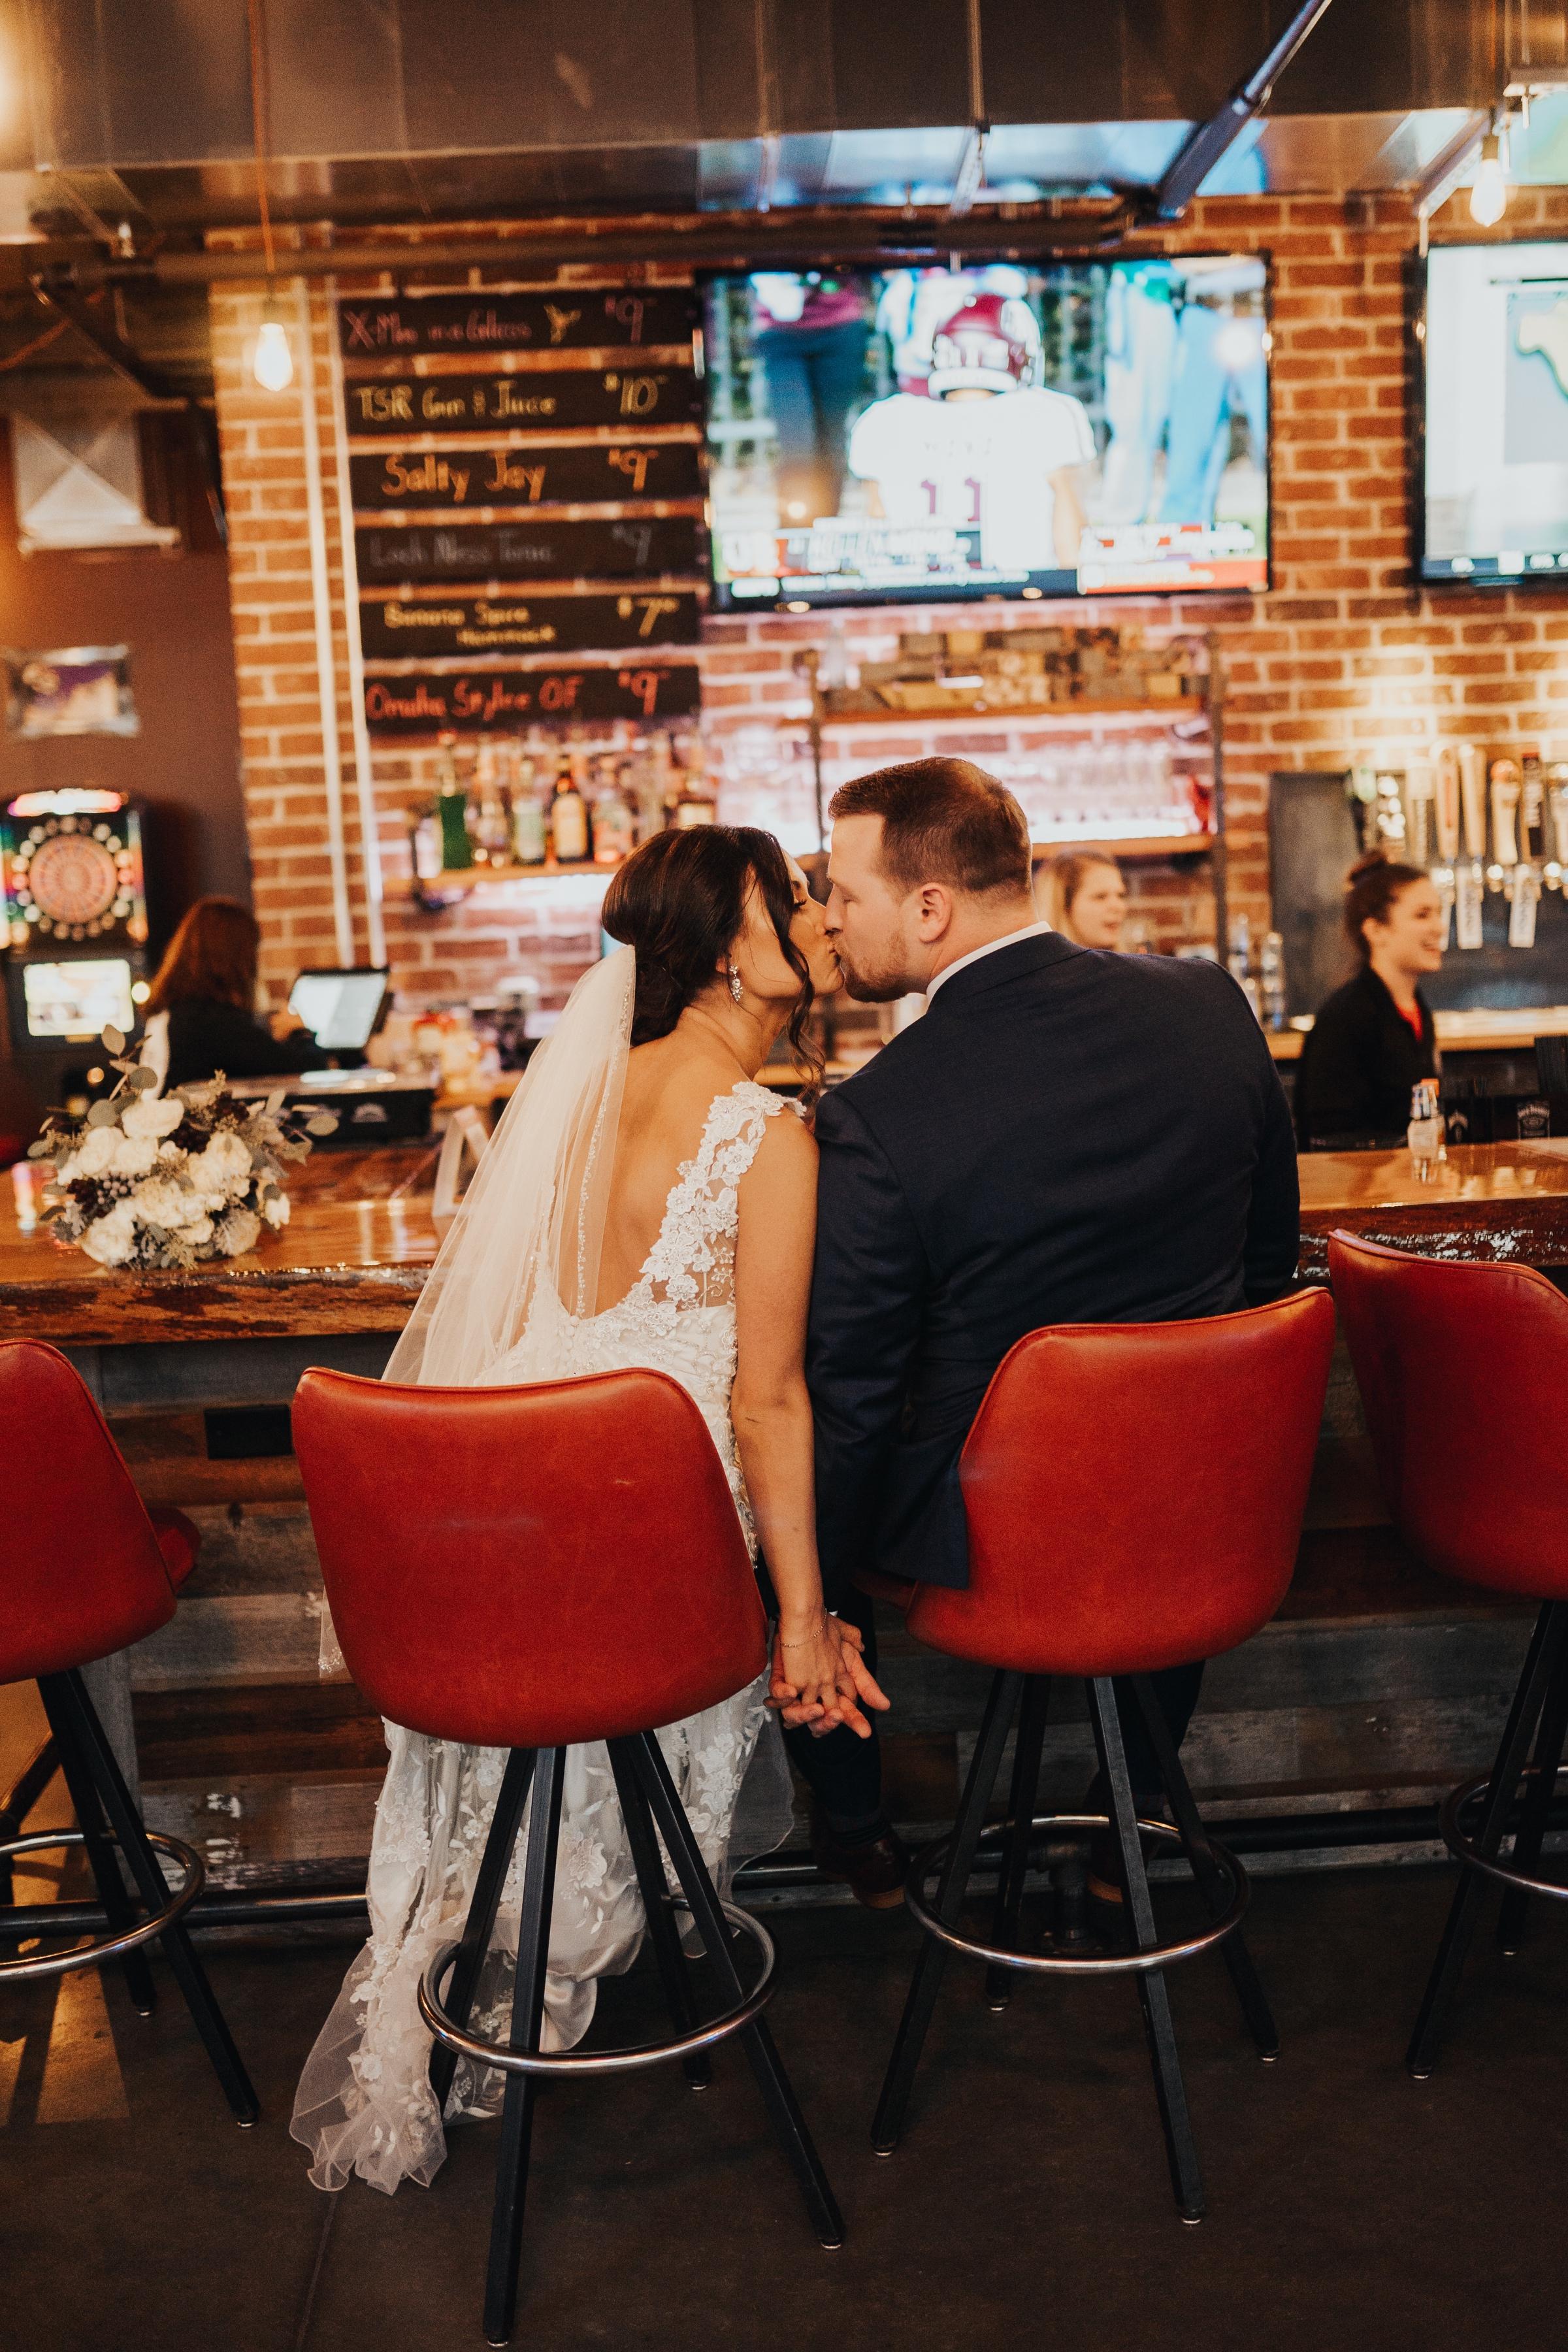 omaha wedding at the session room bar